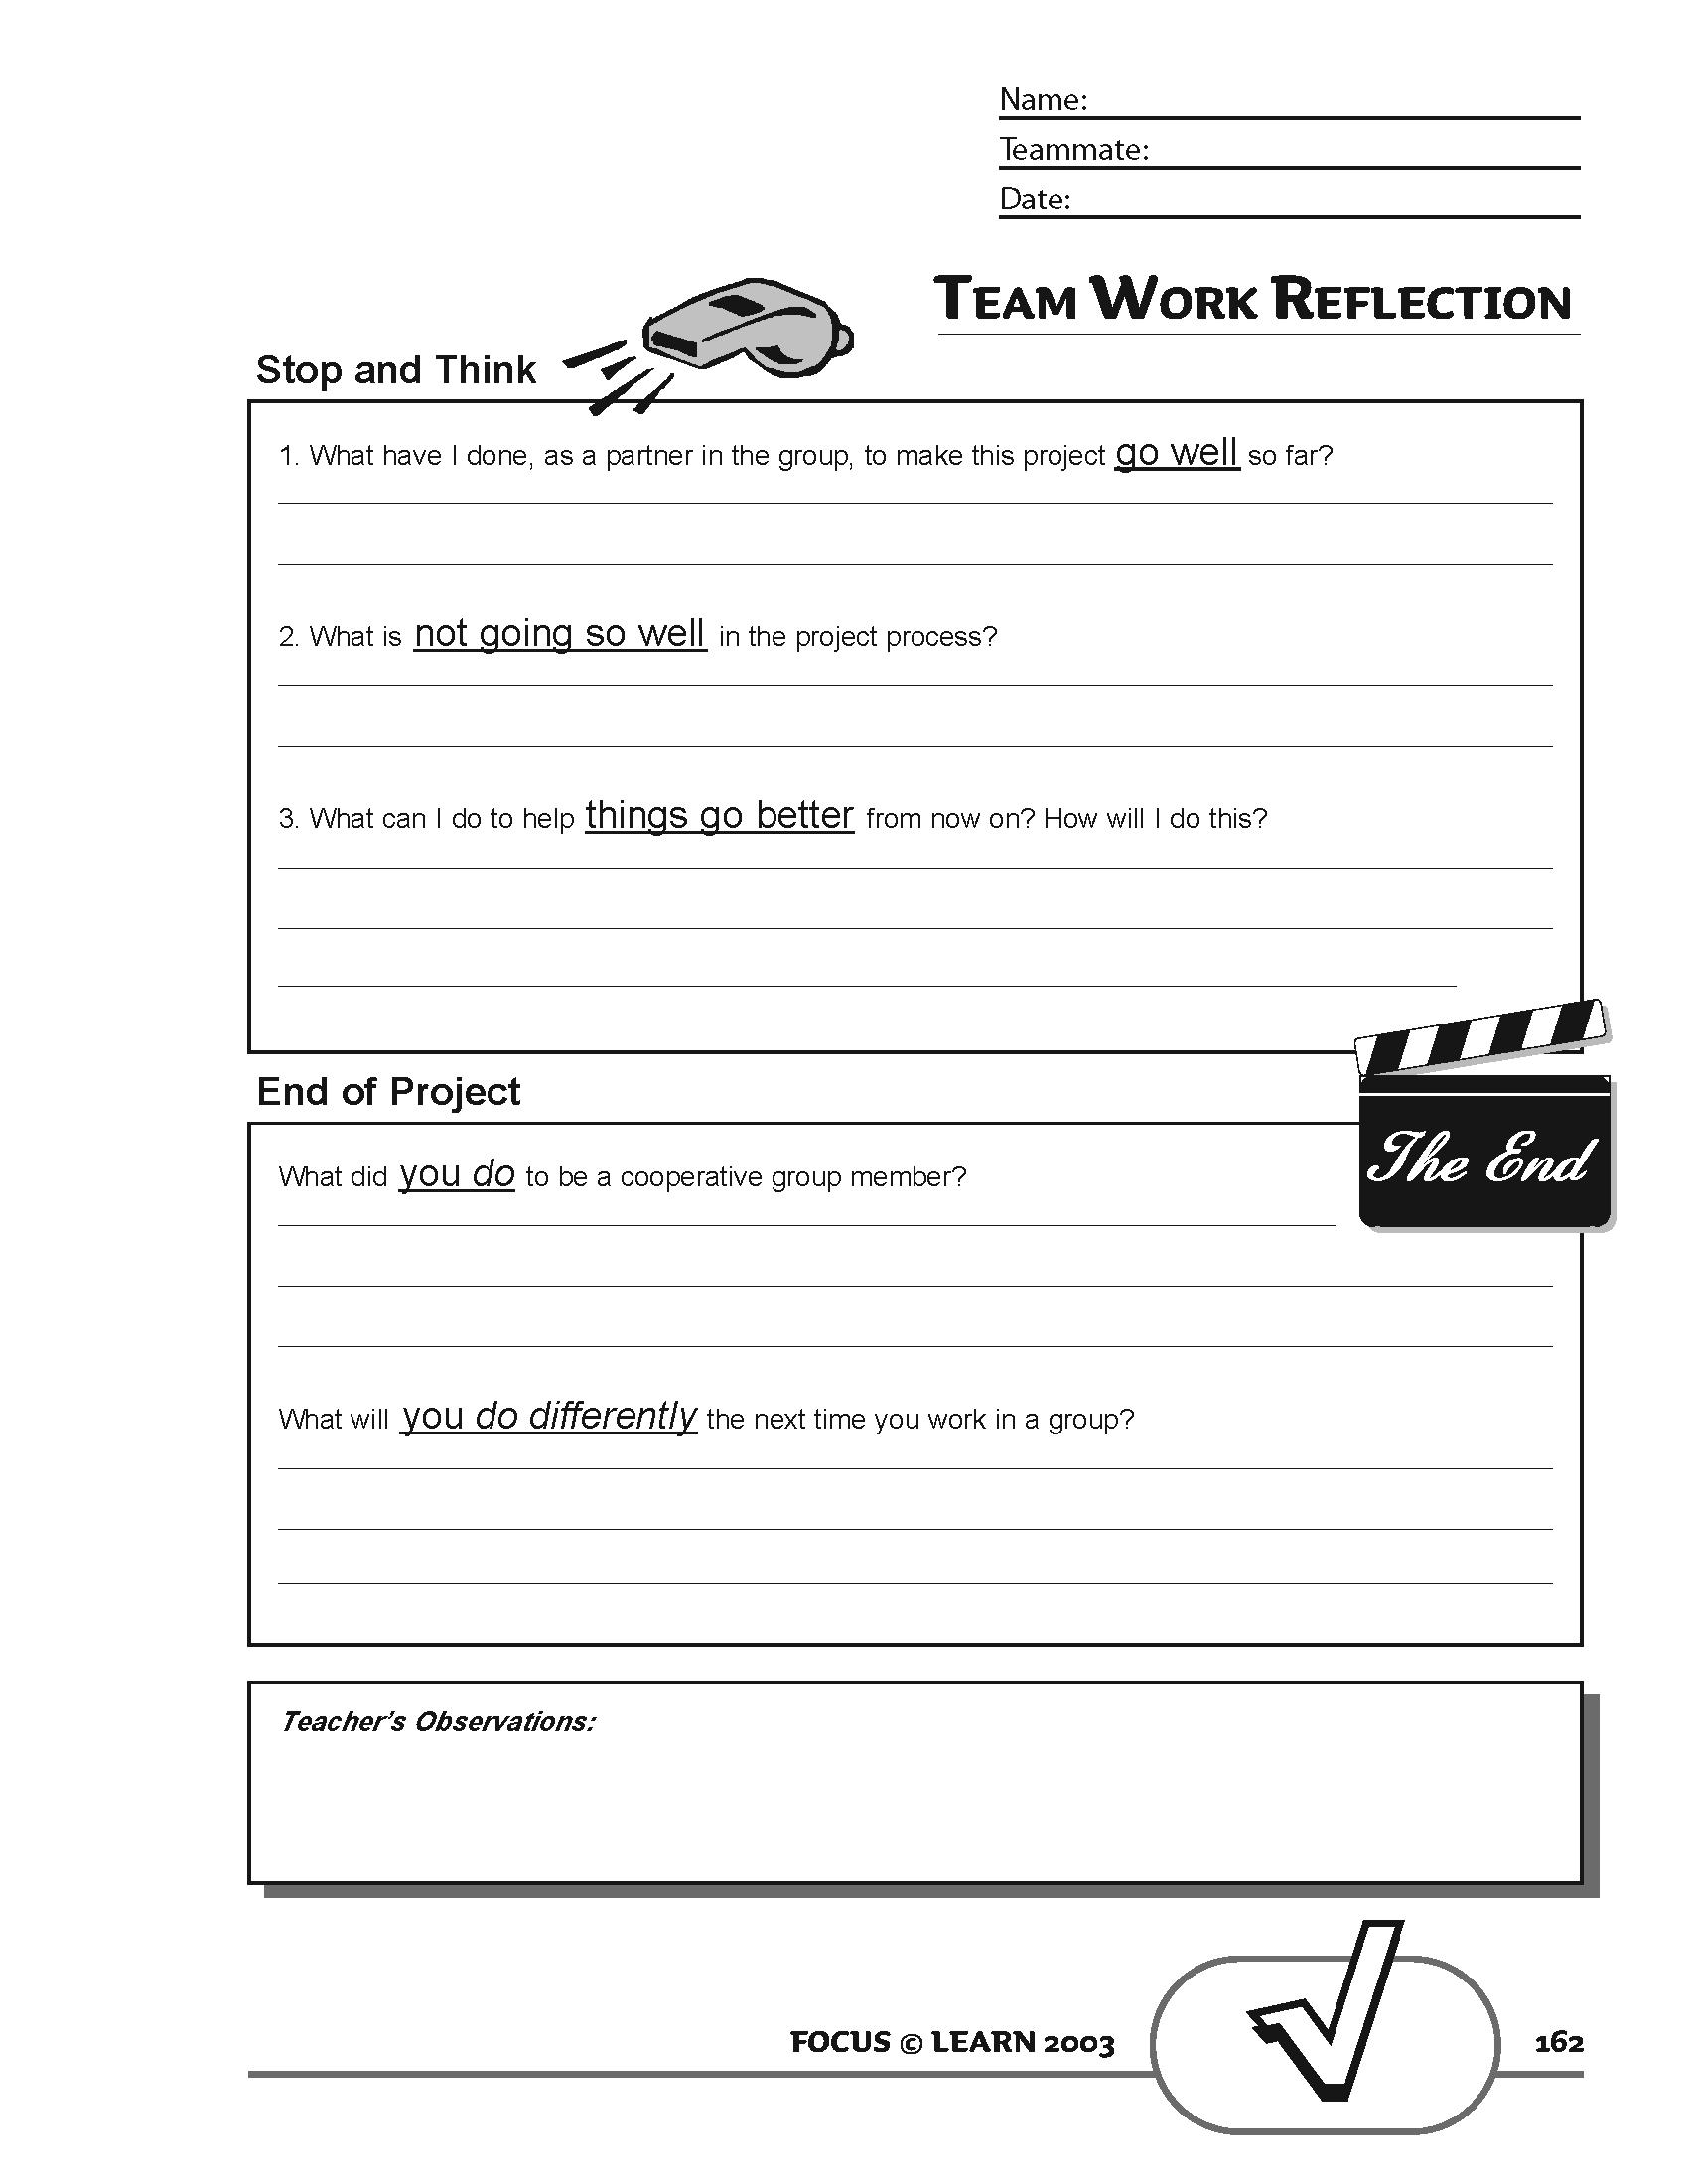 Team Work Reflection Tool